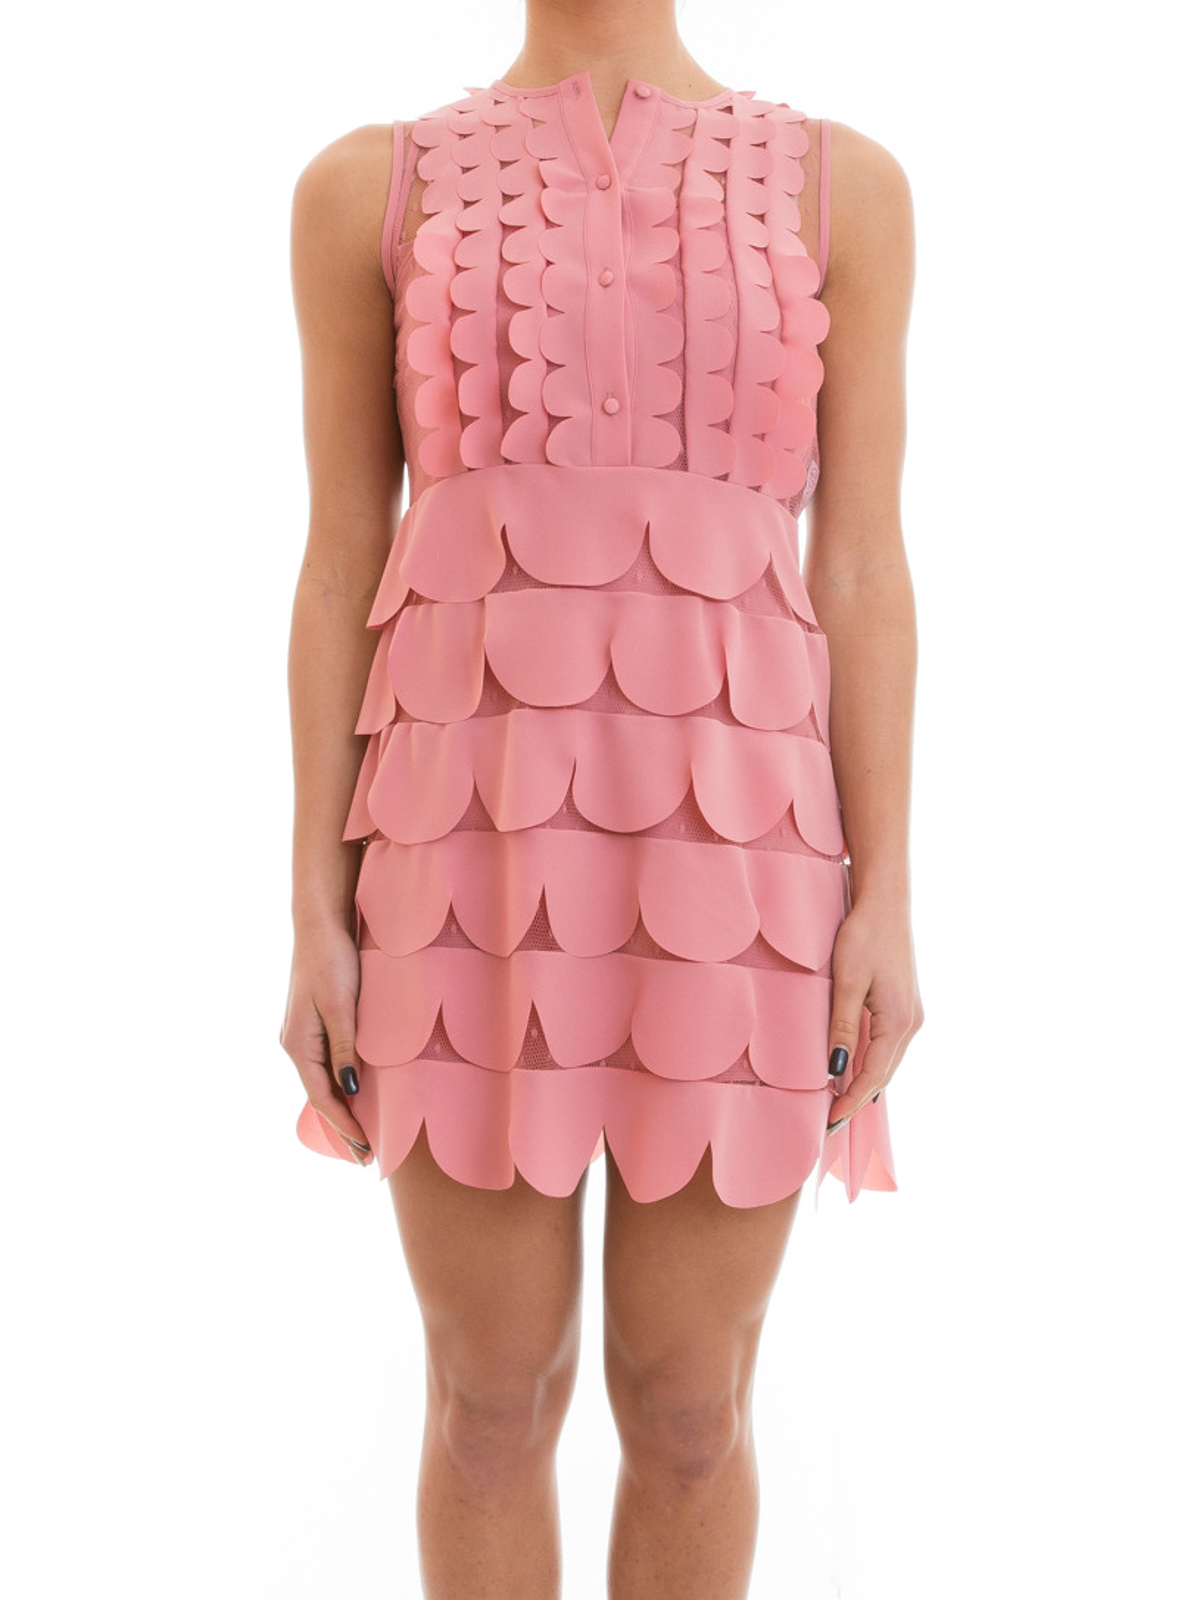 Kurzes kleid pink